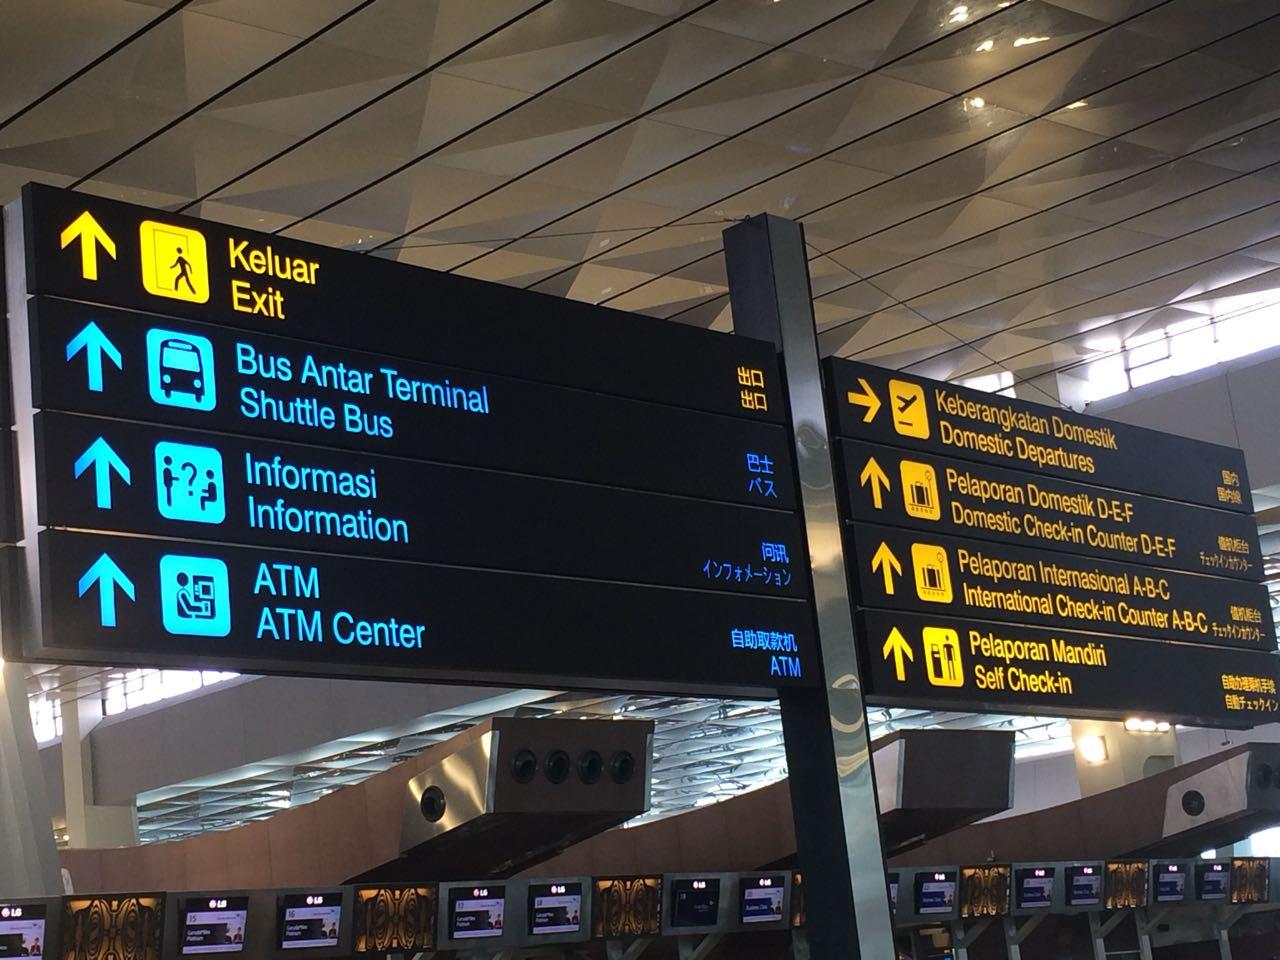 https: img.okezone.com content 2020 03 29 320 2190845 penerbangan-dari-bandara-adisutjipto-dipindah-ke-yia-dengan-protokol-pencegahan-covid-19-tNjTMalpP4.jpg